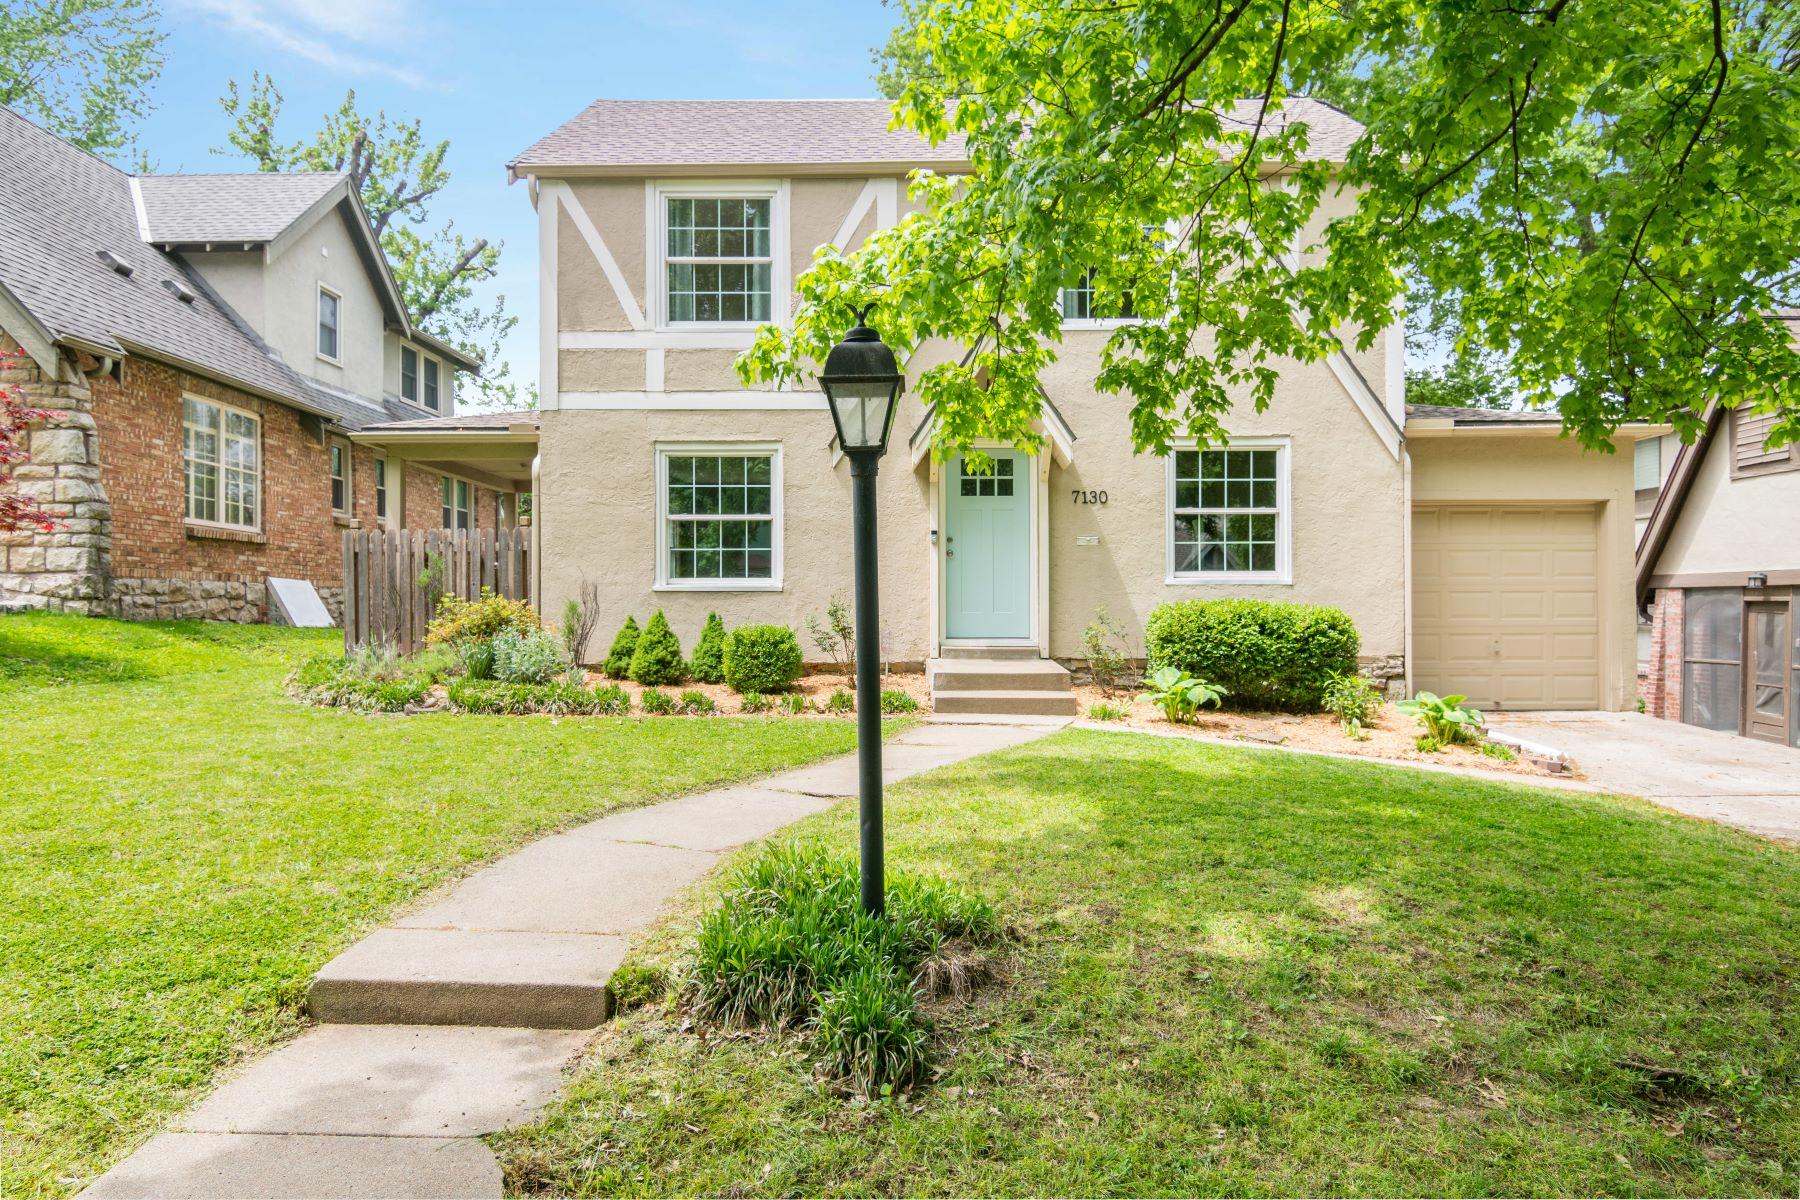 Single Family Homes for Active at Cute Waldo 2 Story 7130 McGee Street Kansas City, Missouri 64114 United States